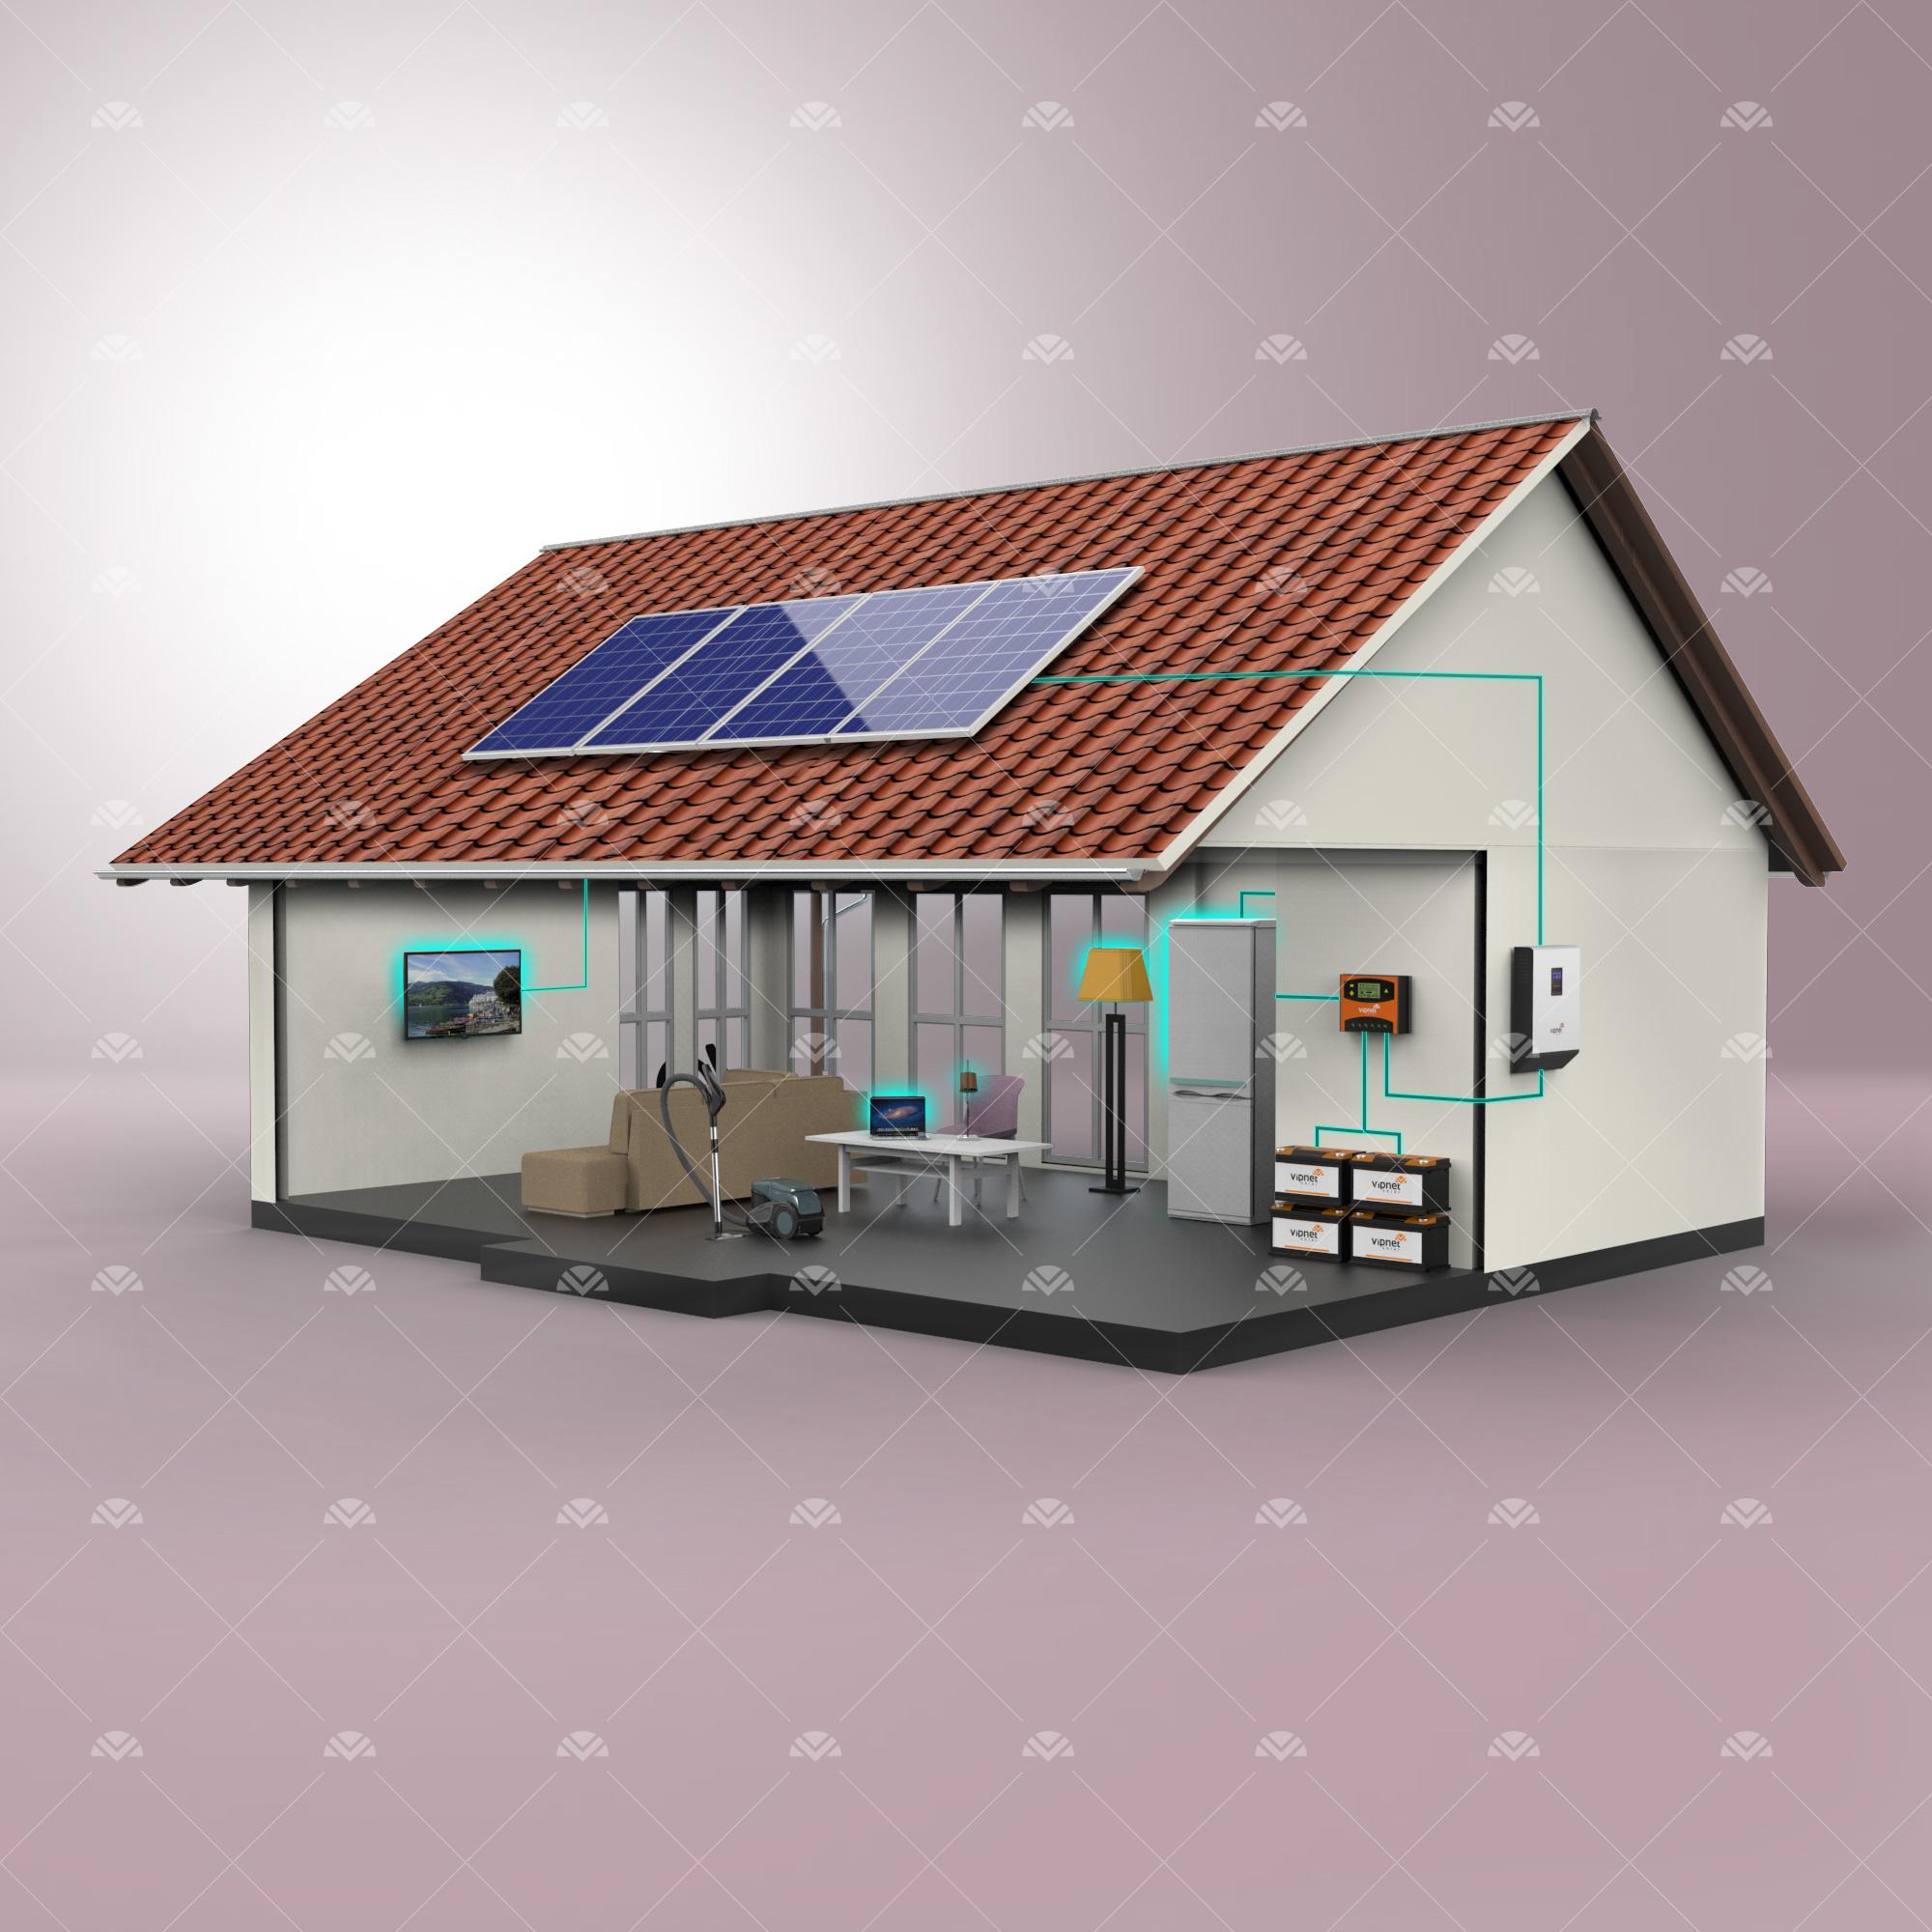 Solar Paket 3-lamba, tv, büyük buzdolabı, şarj cihazı, süpürge